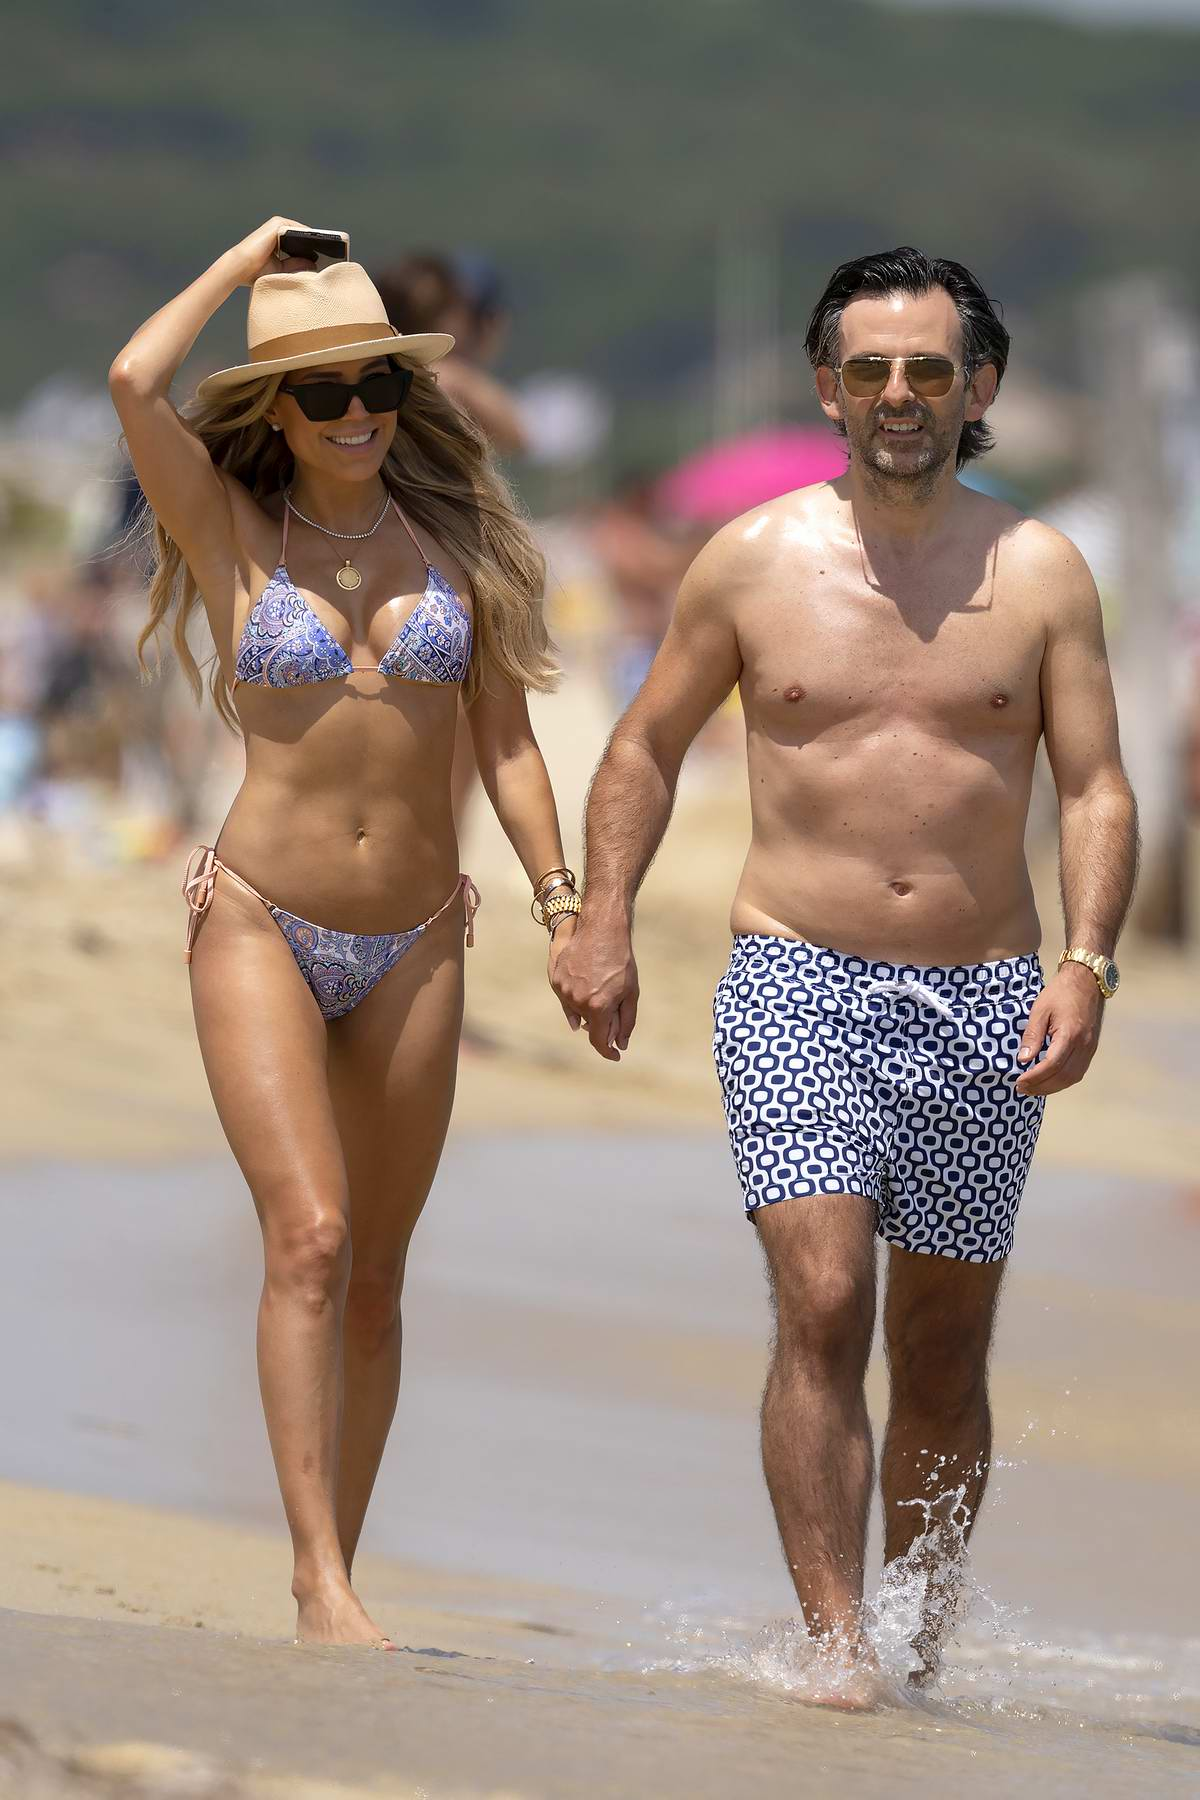 Sylvie Meis wears a patterned blue bikini while enjoying a beach day with fiance Niclas Castello in Saint Tropez, France